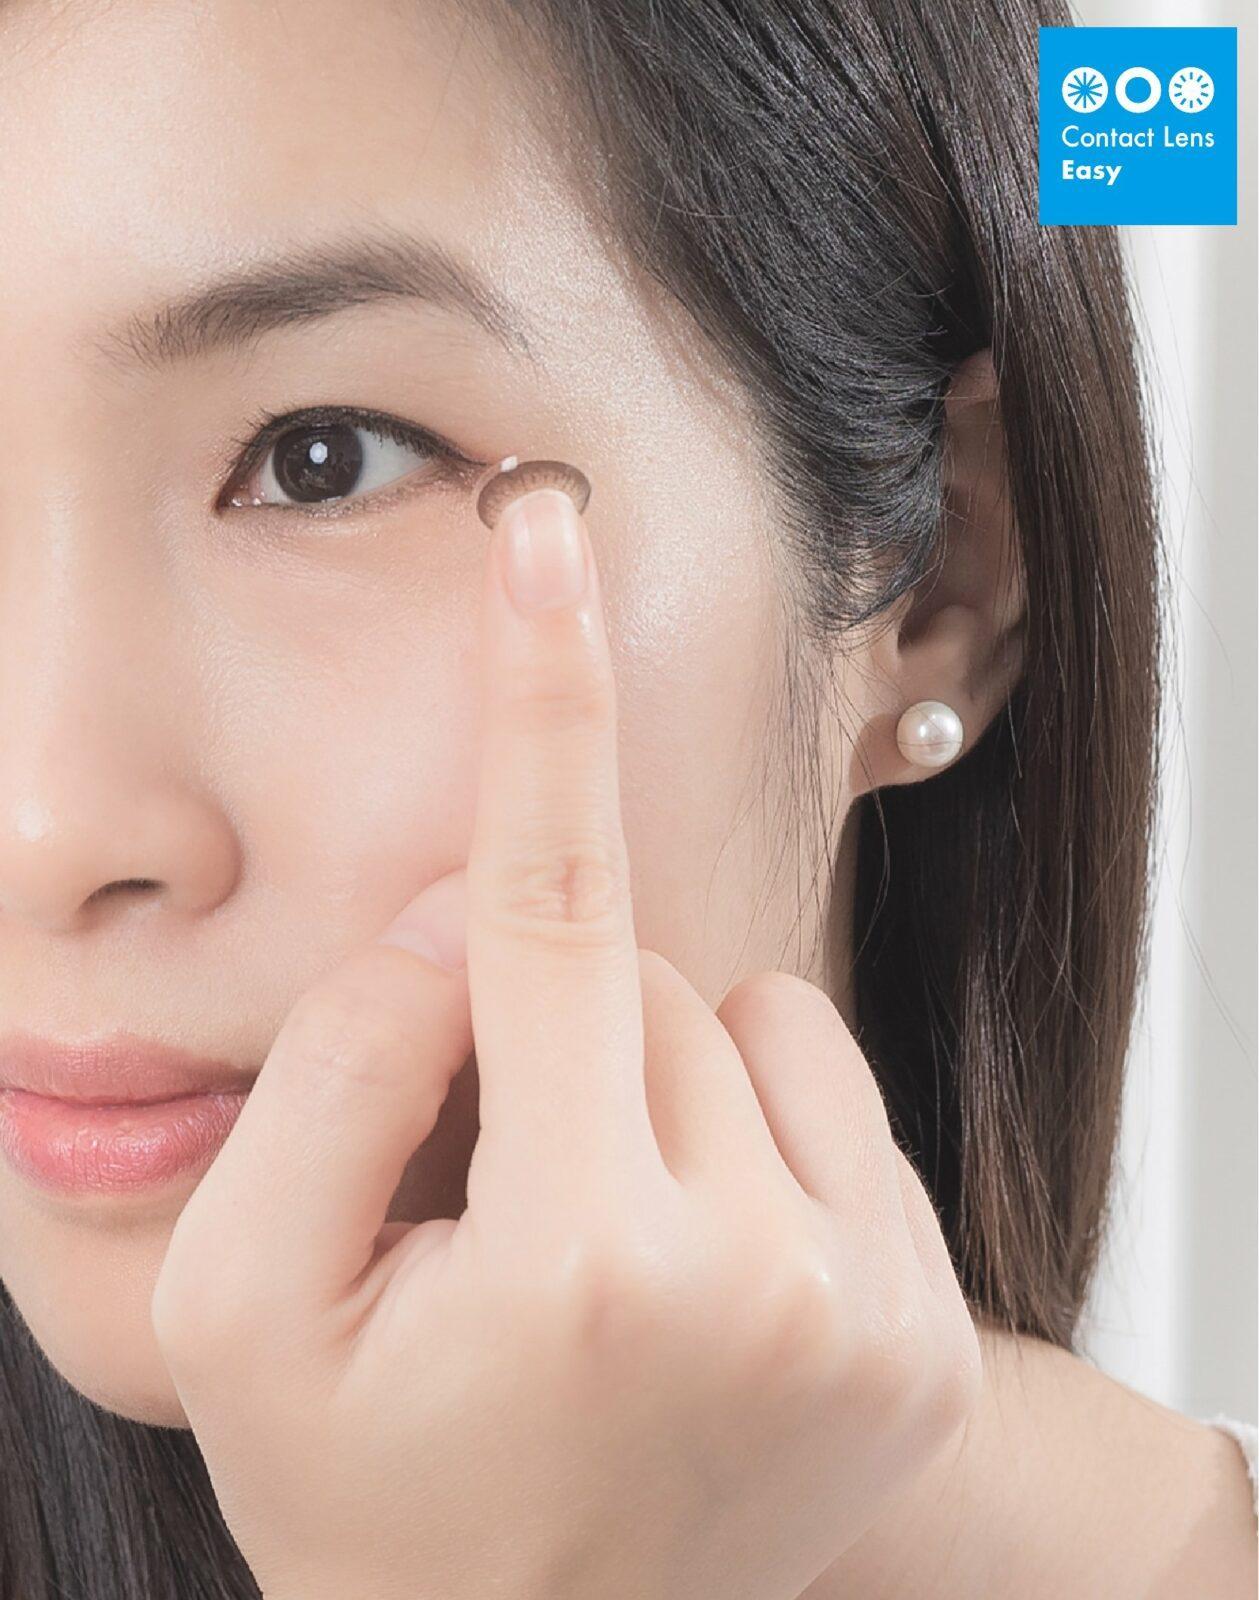 contact lens easy x mocha jewellery - 母親節特別獻禮 媽媽們也有愛美的權利